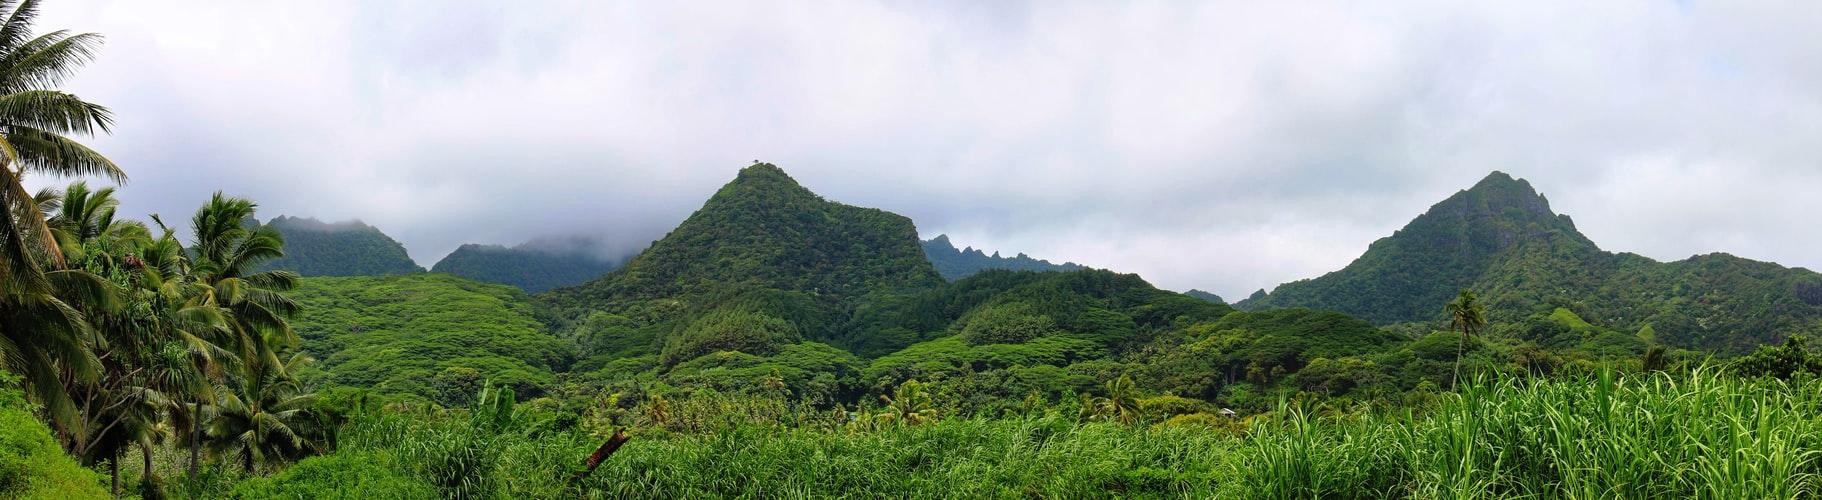 Blick auf Regenwald in Rarotonga Cookinseln